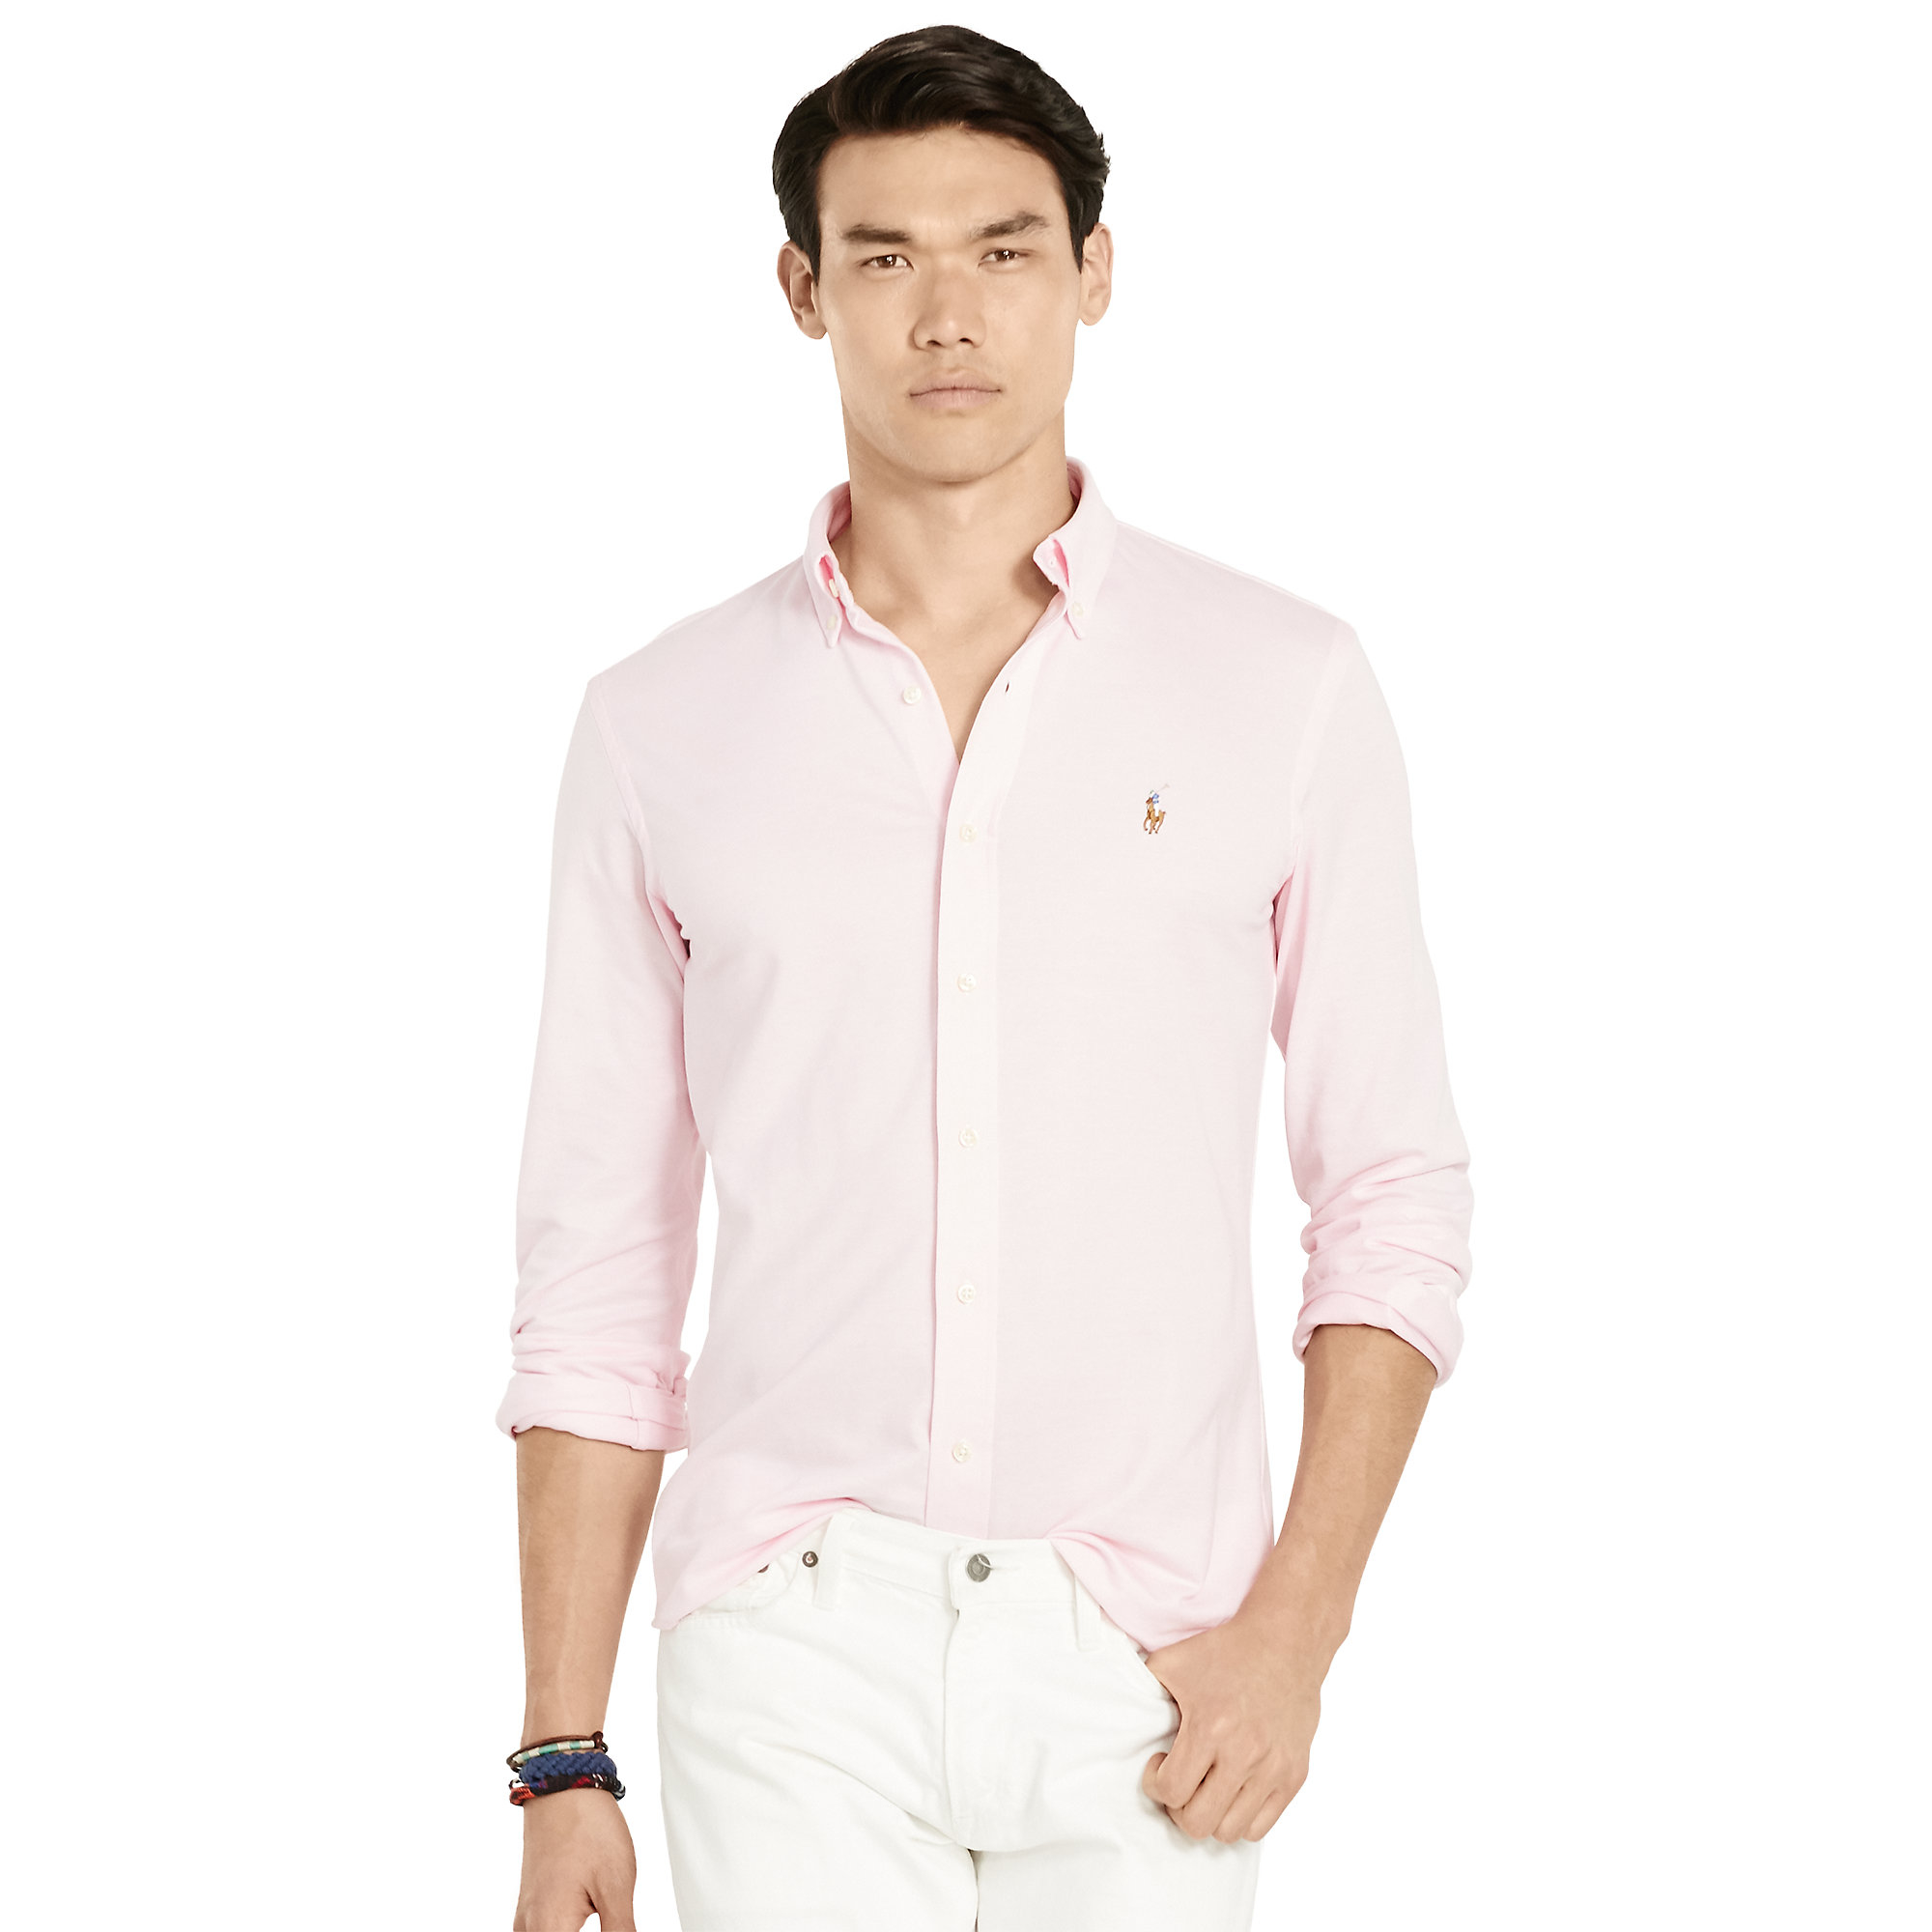 polo ralph lauren slim fit knit oxford in pink for men lyst. Black Bedroom Furniture Sets. Home Design Ideas